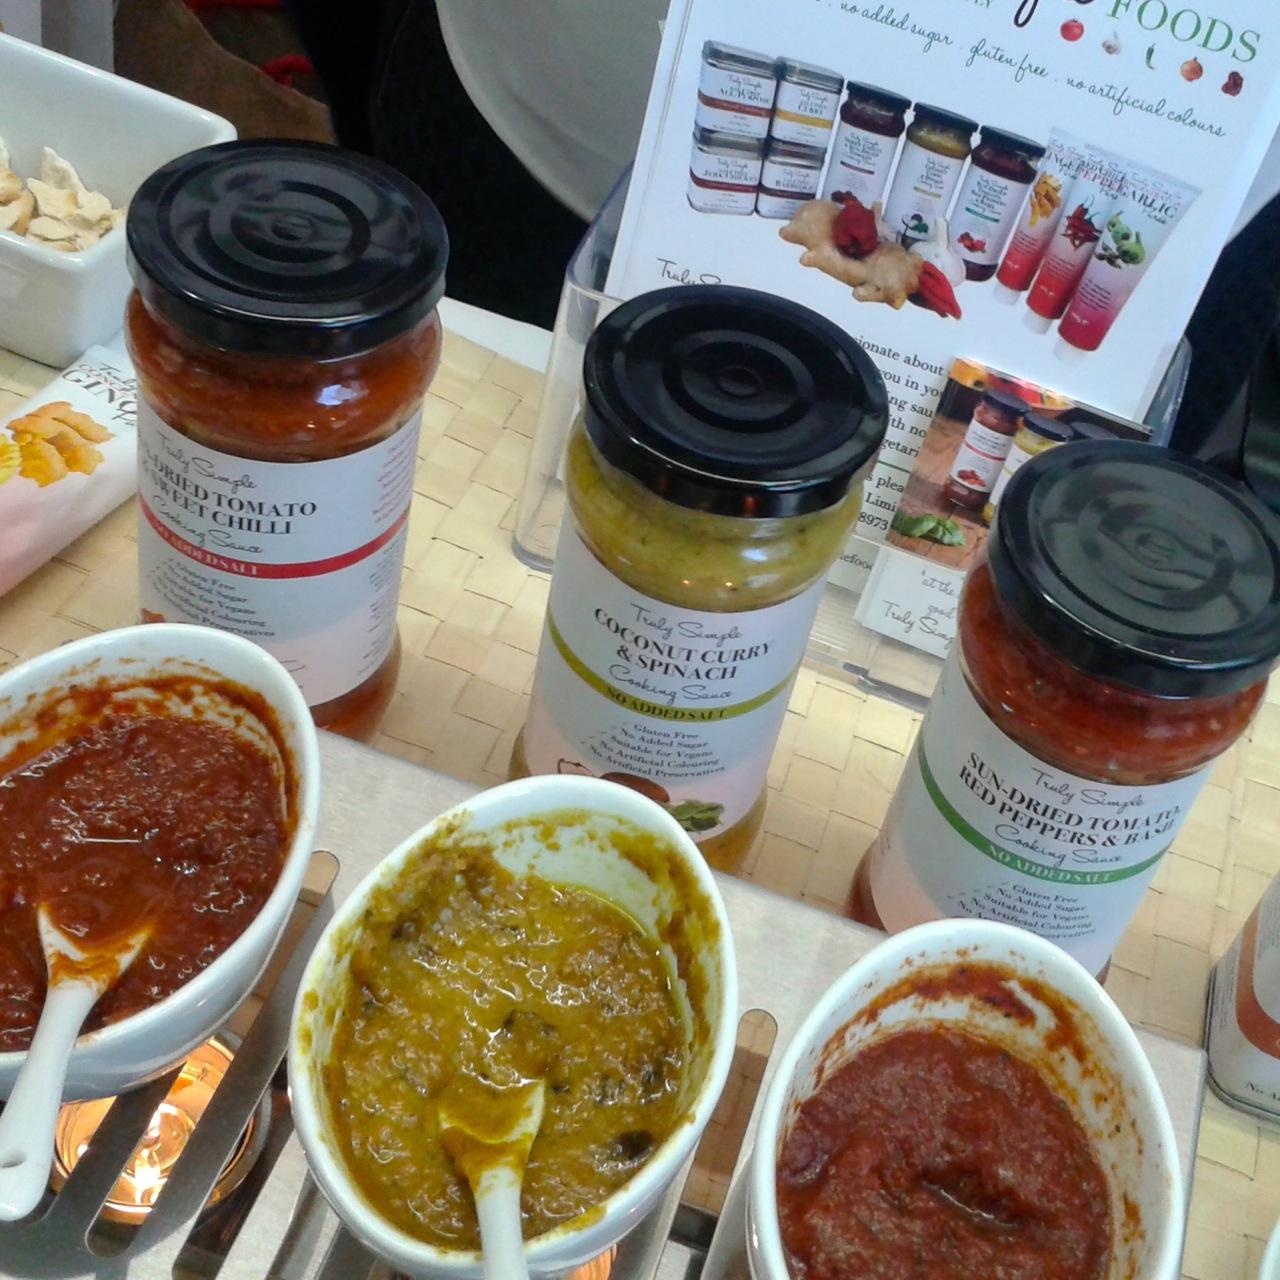 http://i2.wp.com/fatgayvegan.com/wp-content/uploads/2014/09/truly-simple-sauces.jpg?fit=1280%2C1280